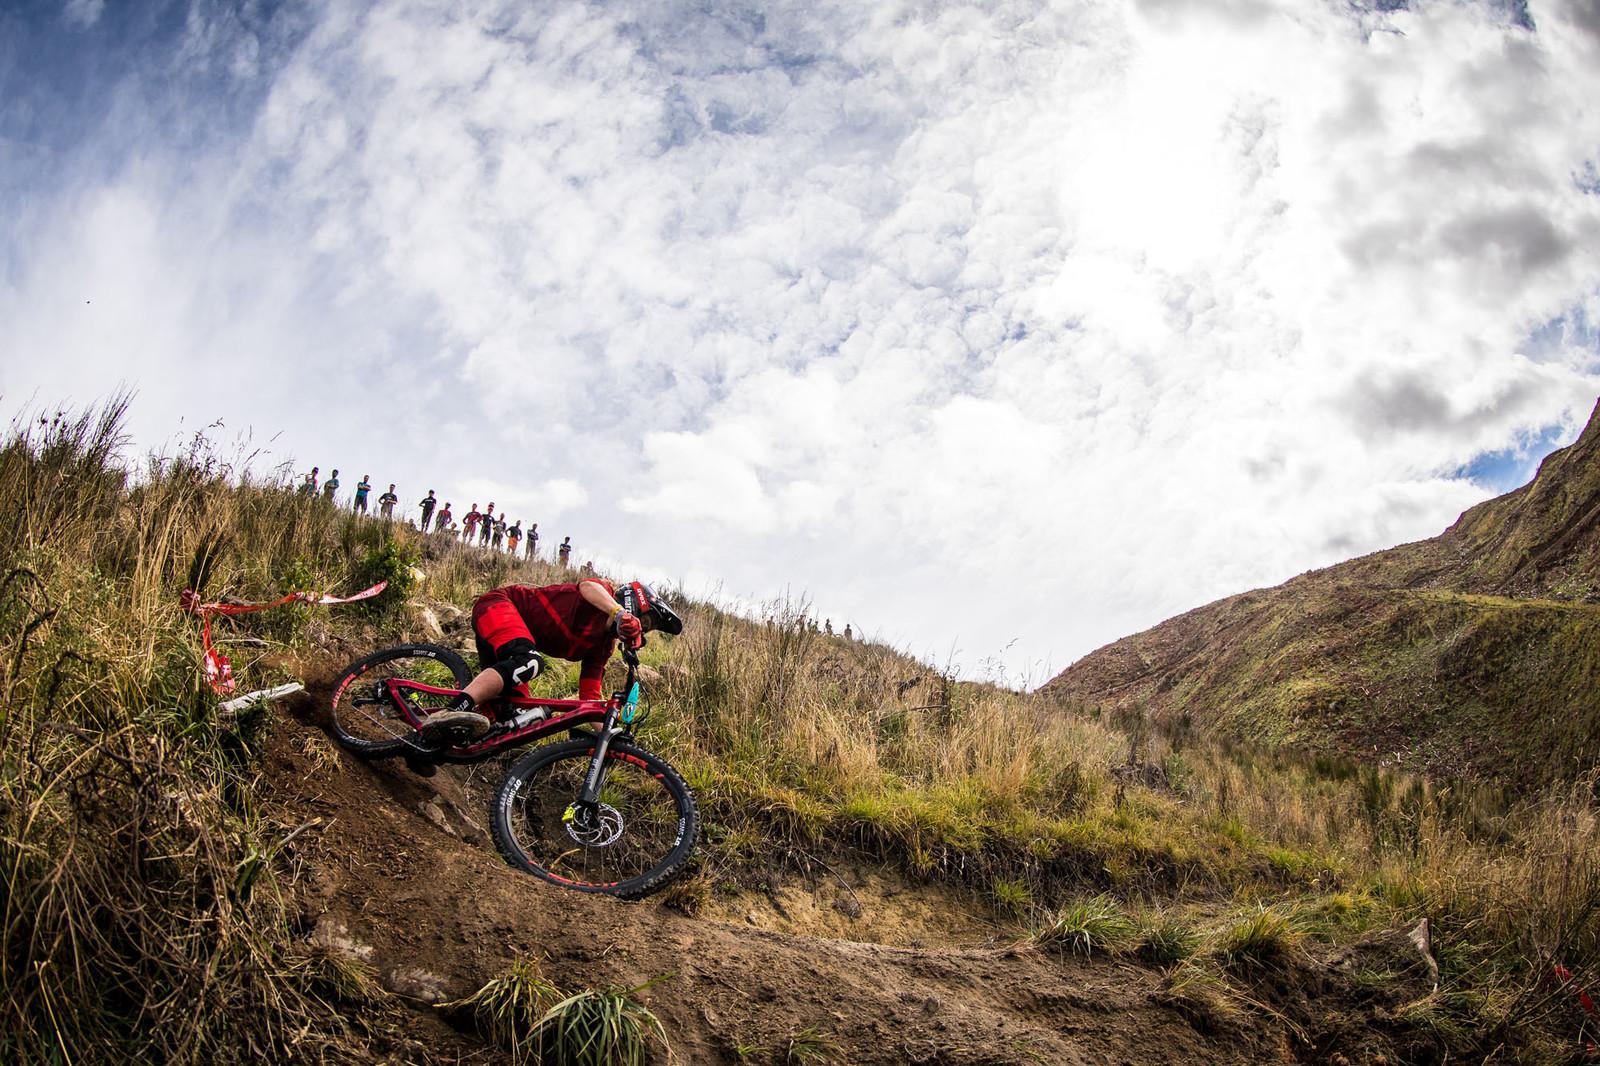 NZEnduro19 BB 898A0185 - 2019 NZ Enduro Day 3 Photo Gallery - Mountain Biking Pictures - Vital MTB